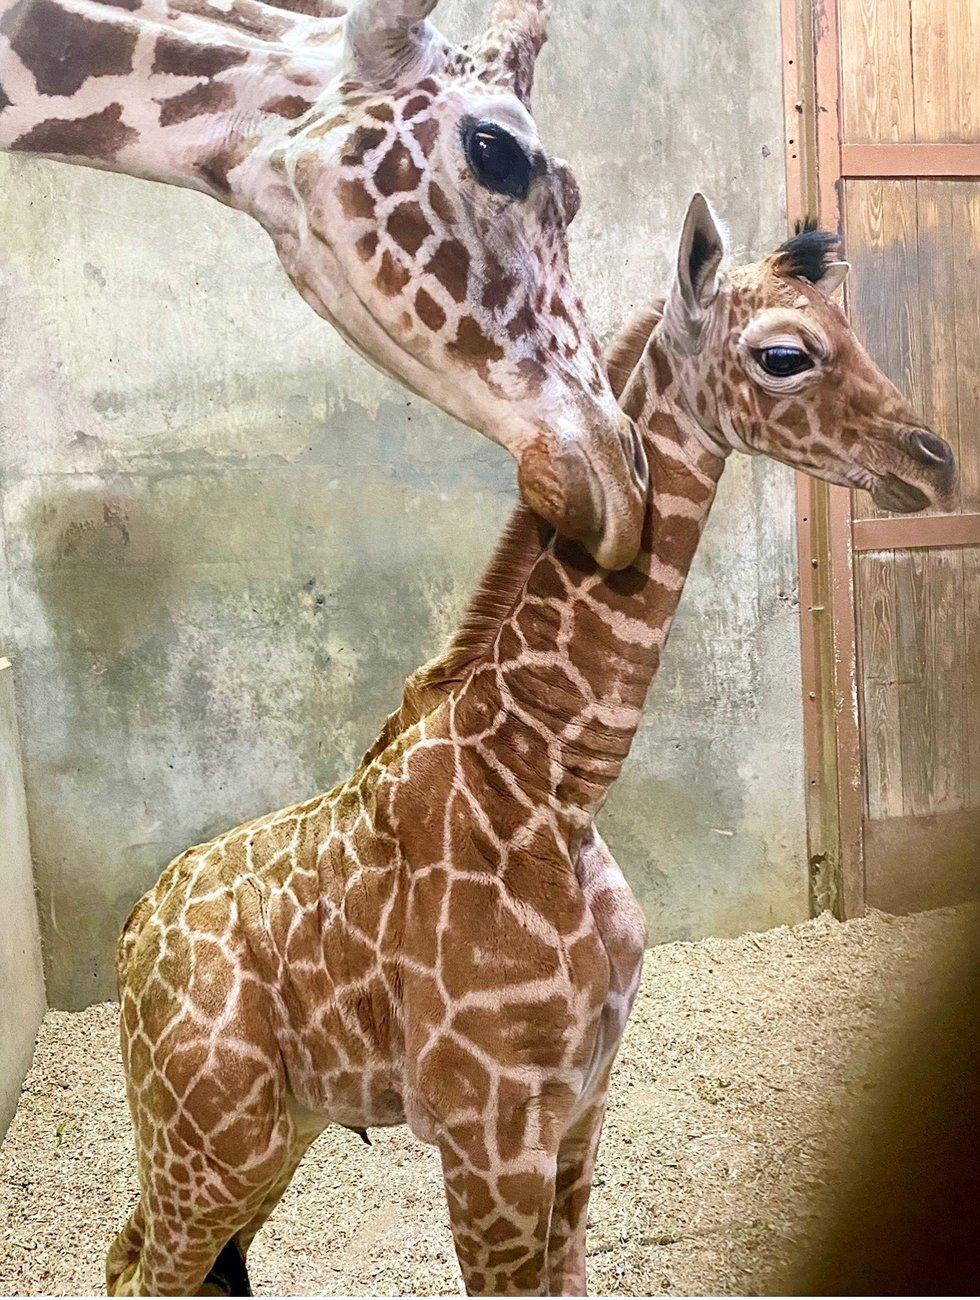 Memphis Zoo welcomes baby giraffe to join the herd